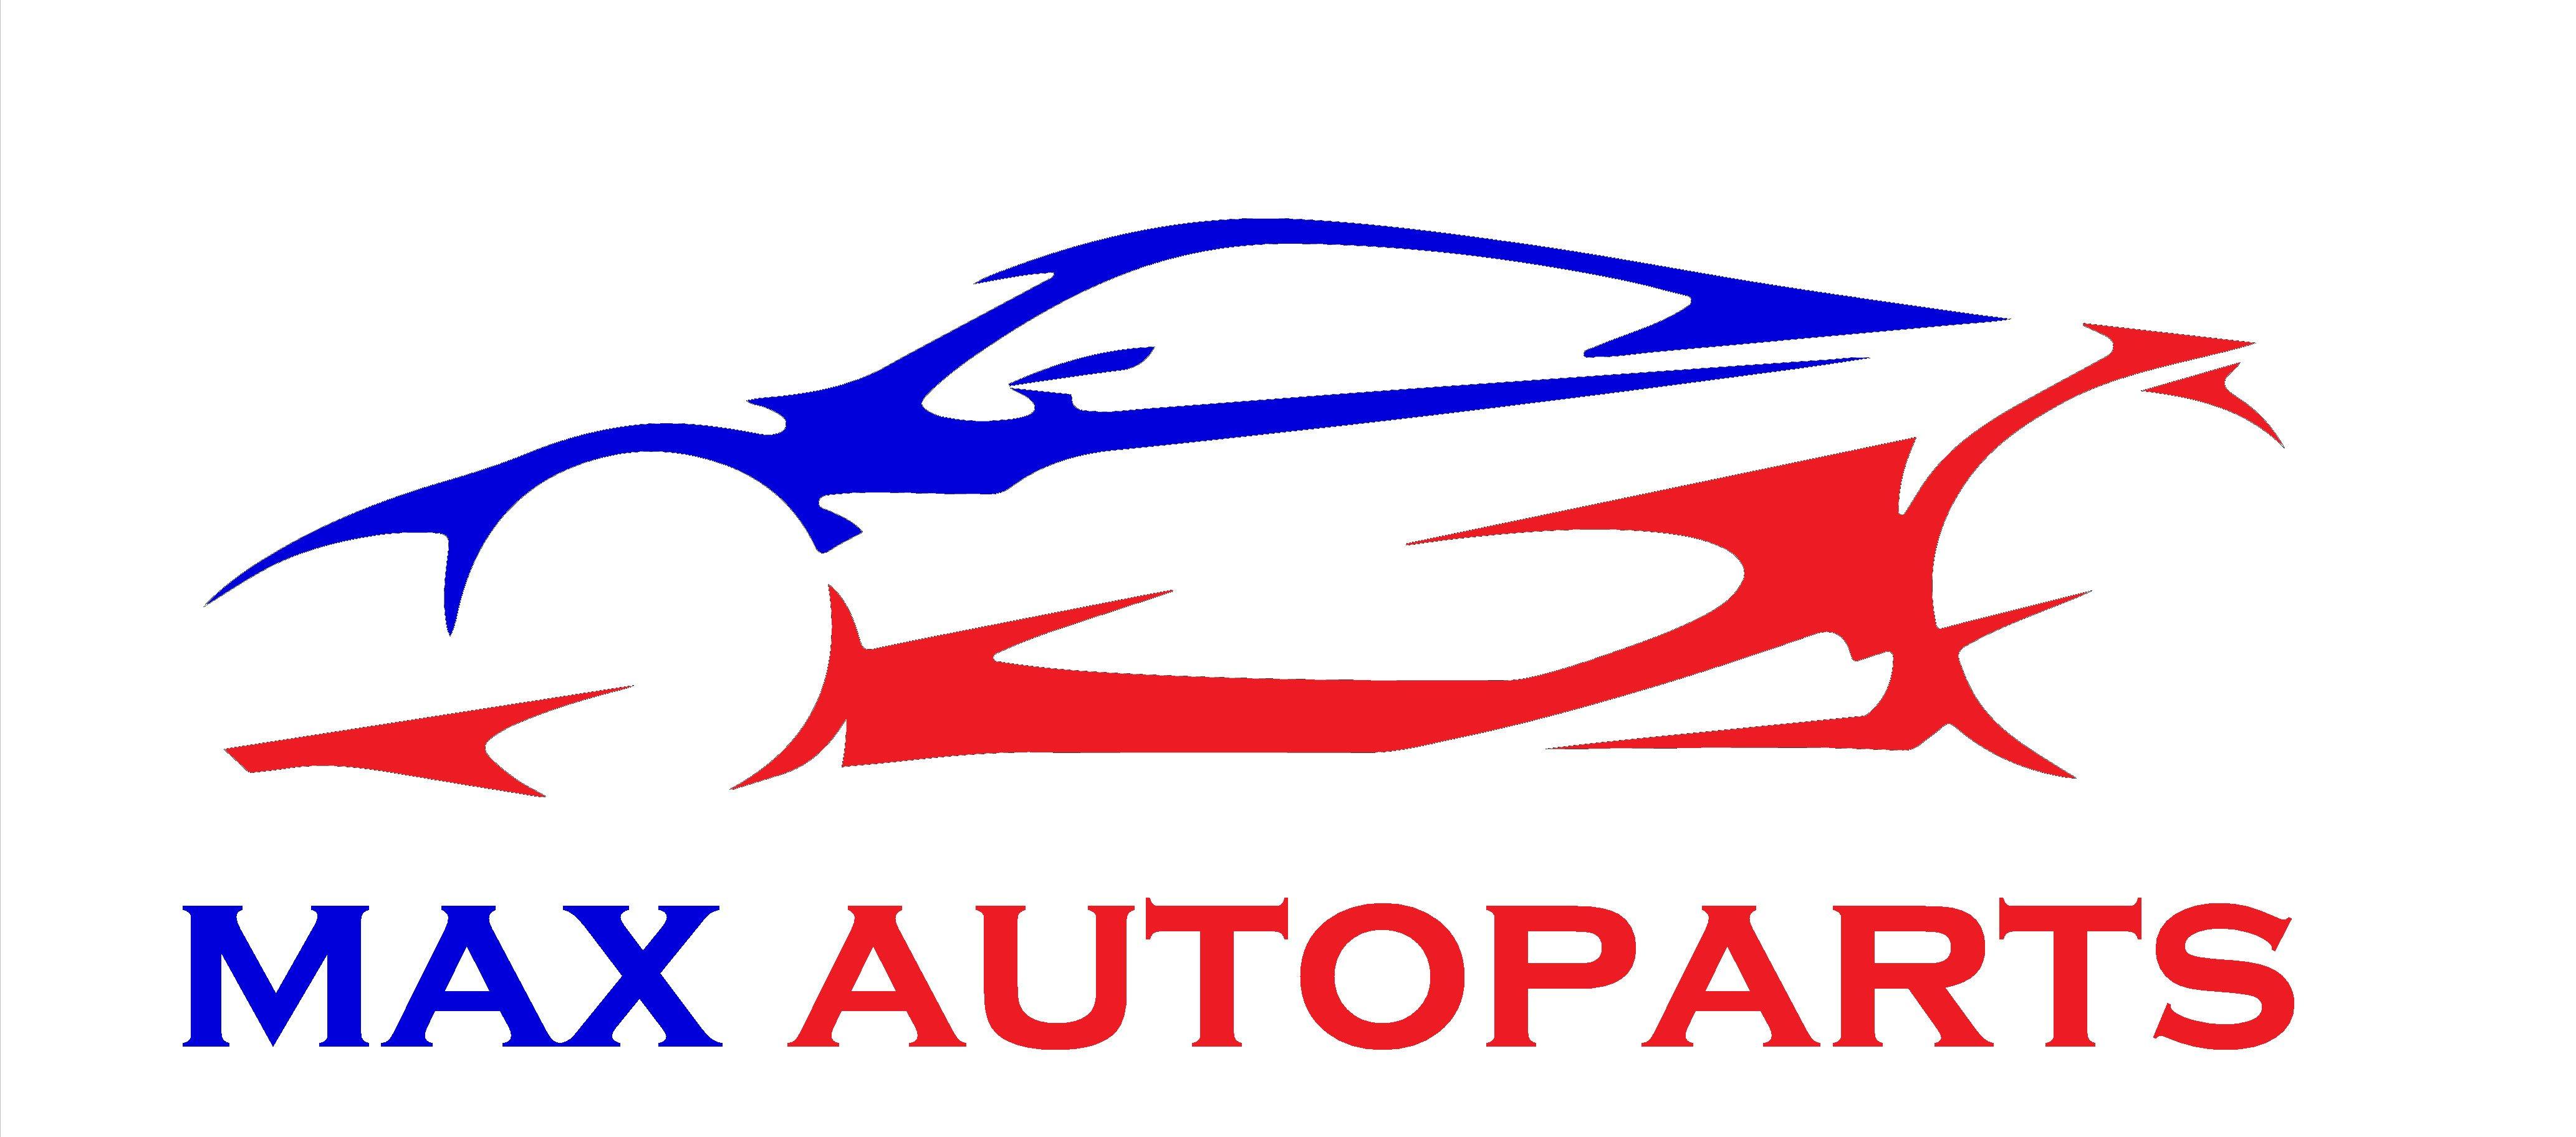 Max Auto Parts Ltd company logo